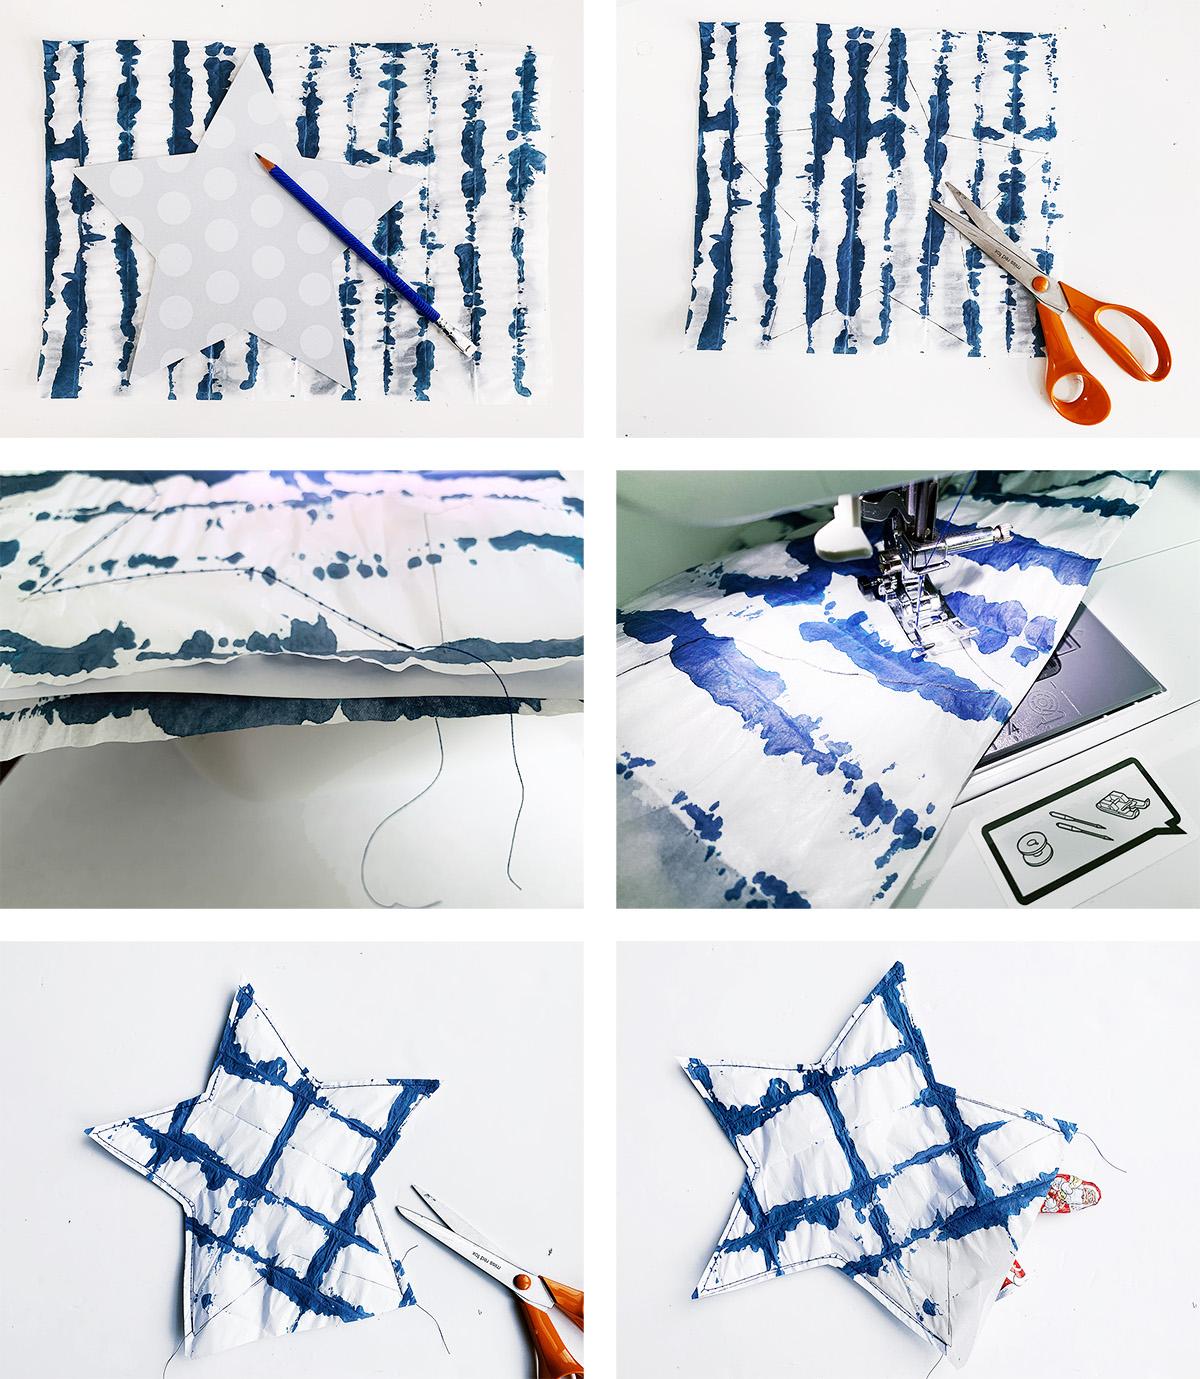 missredfox - 12giftswithlovegoesXMAS - 24 - Genähte Shibori Sterne Geschenkverpackung - 03